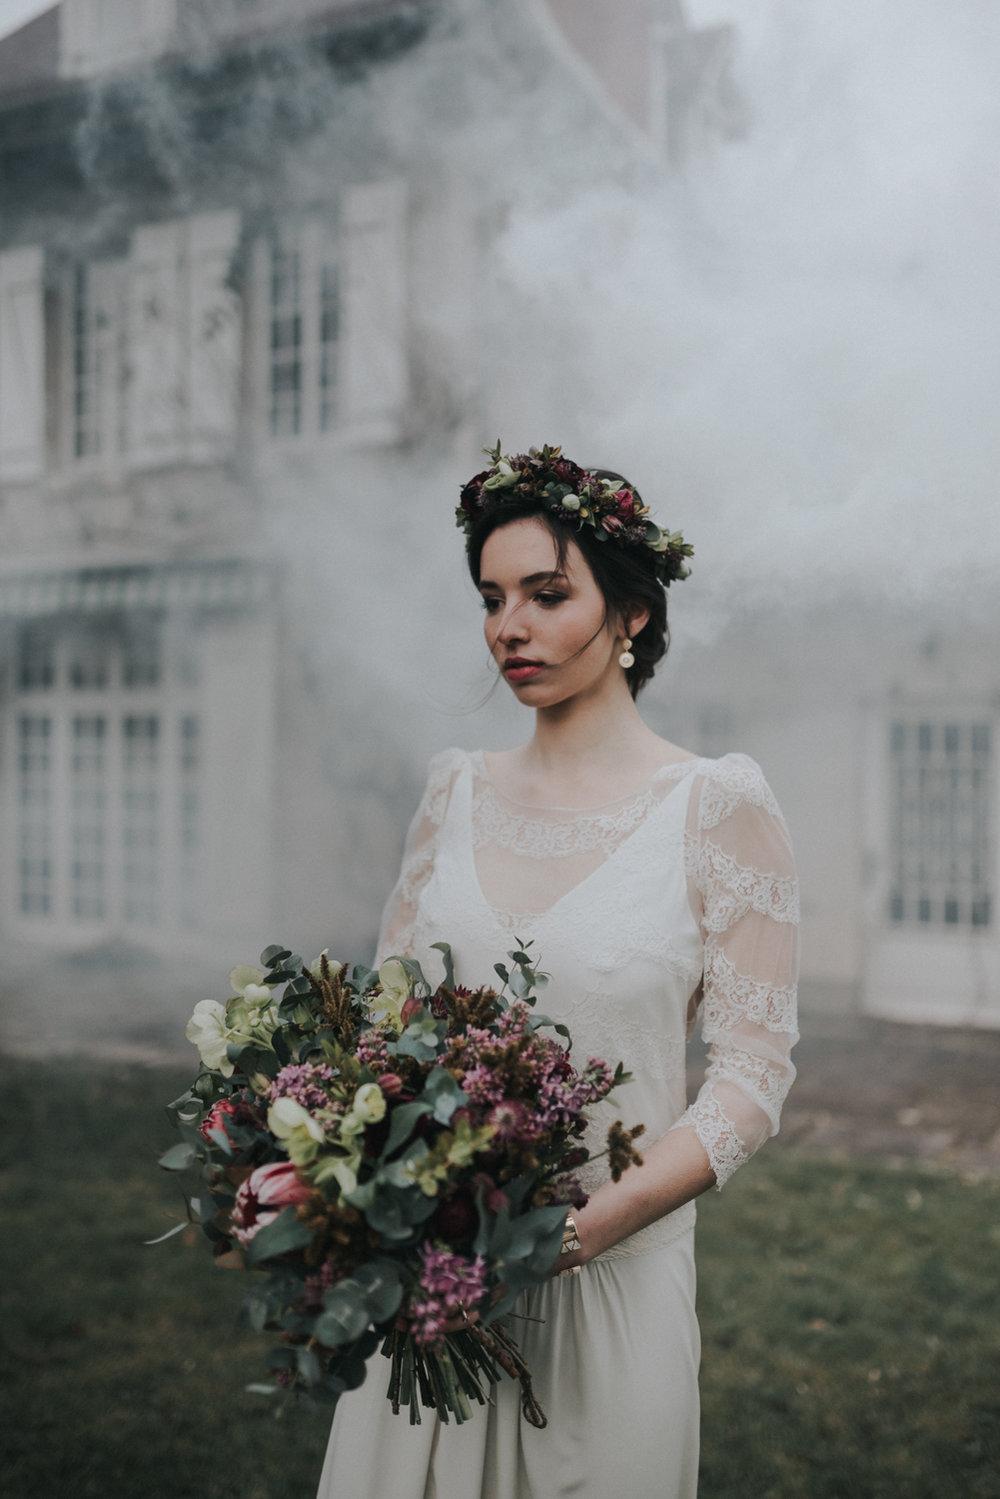 photographe-mariage-paris-5-2.jpg